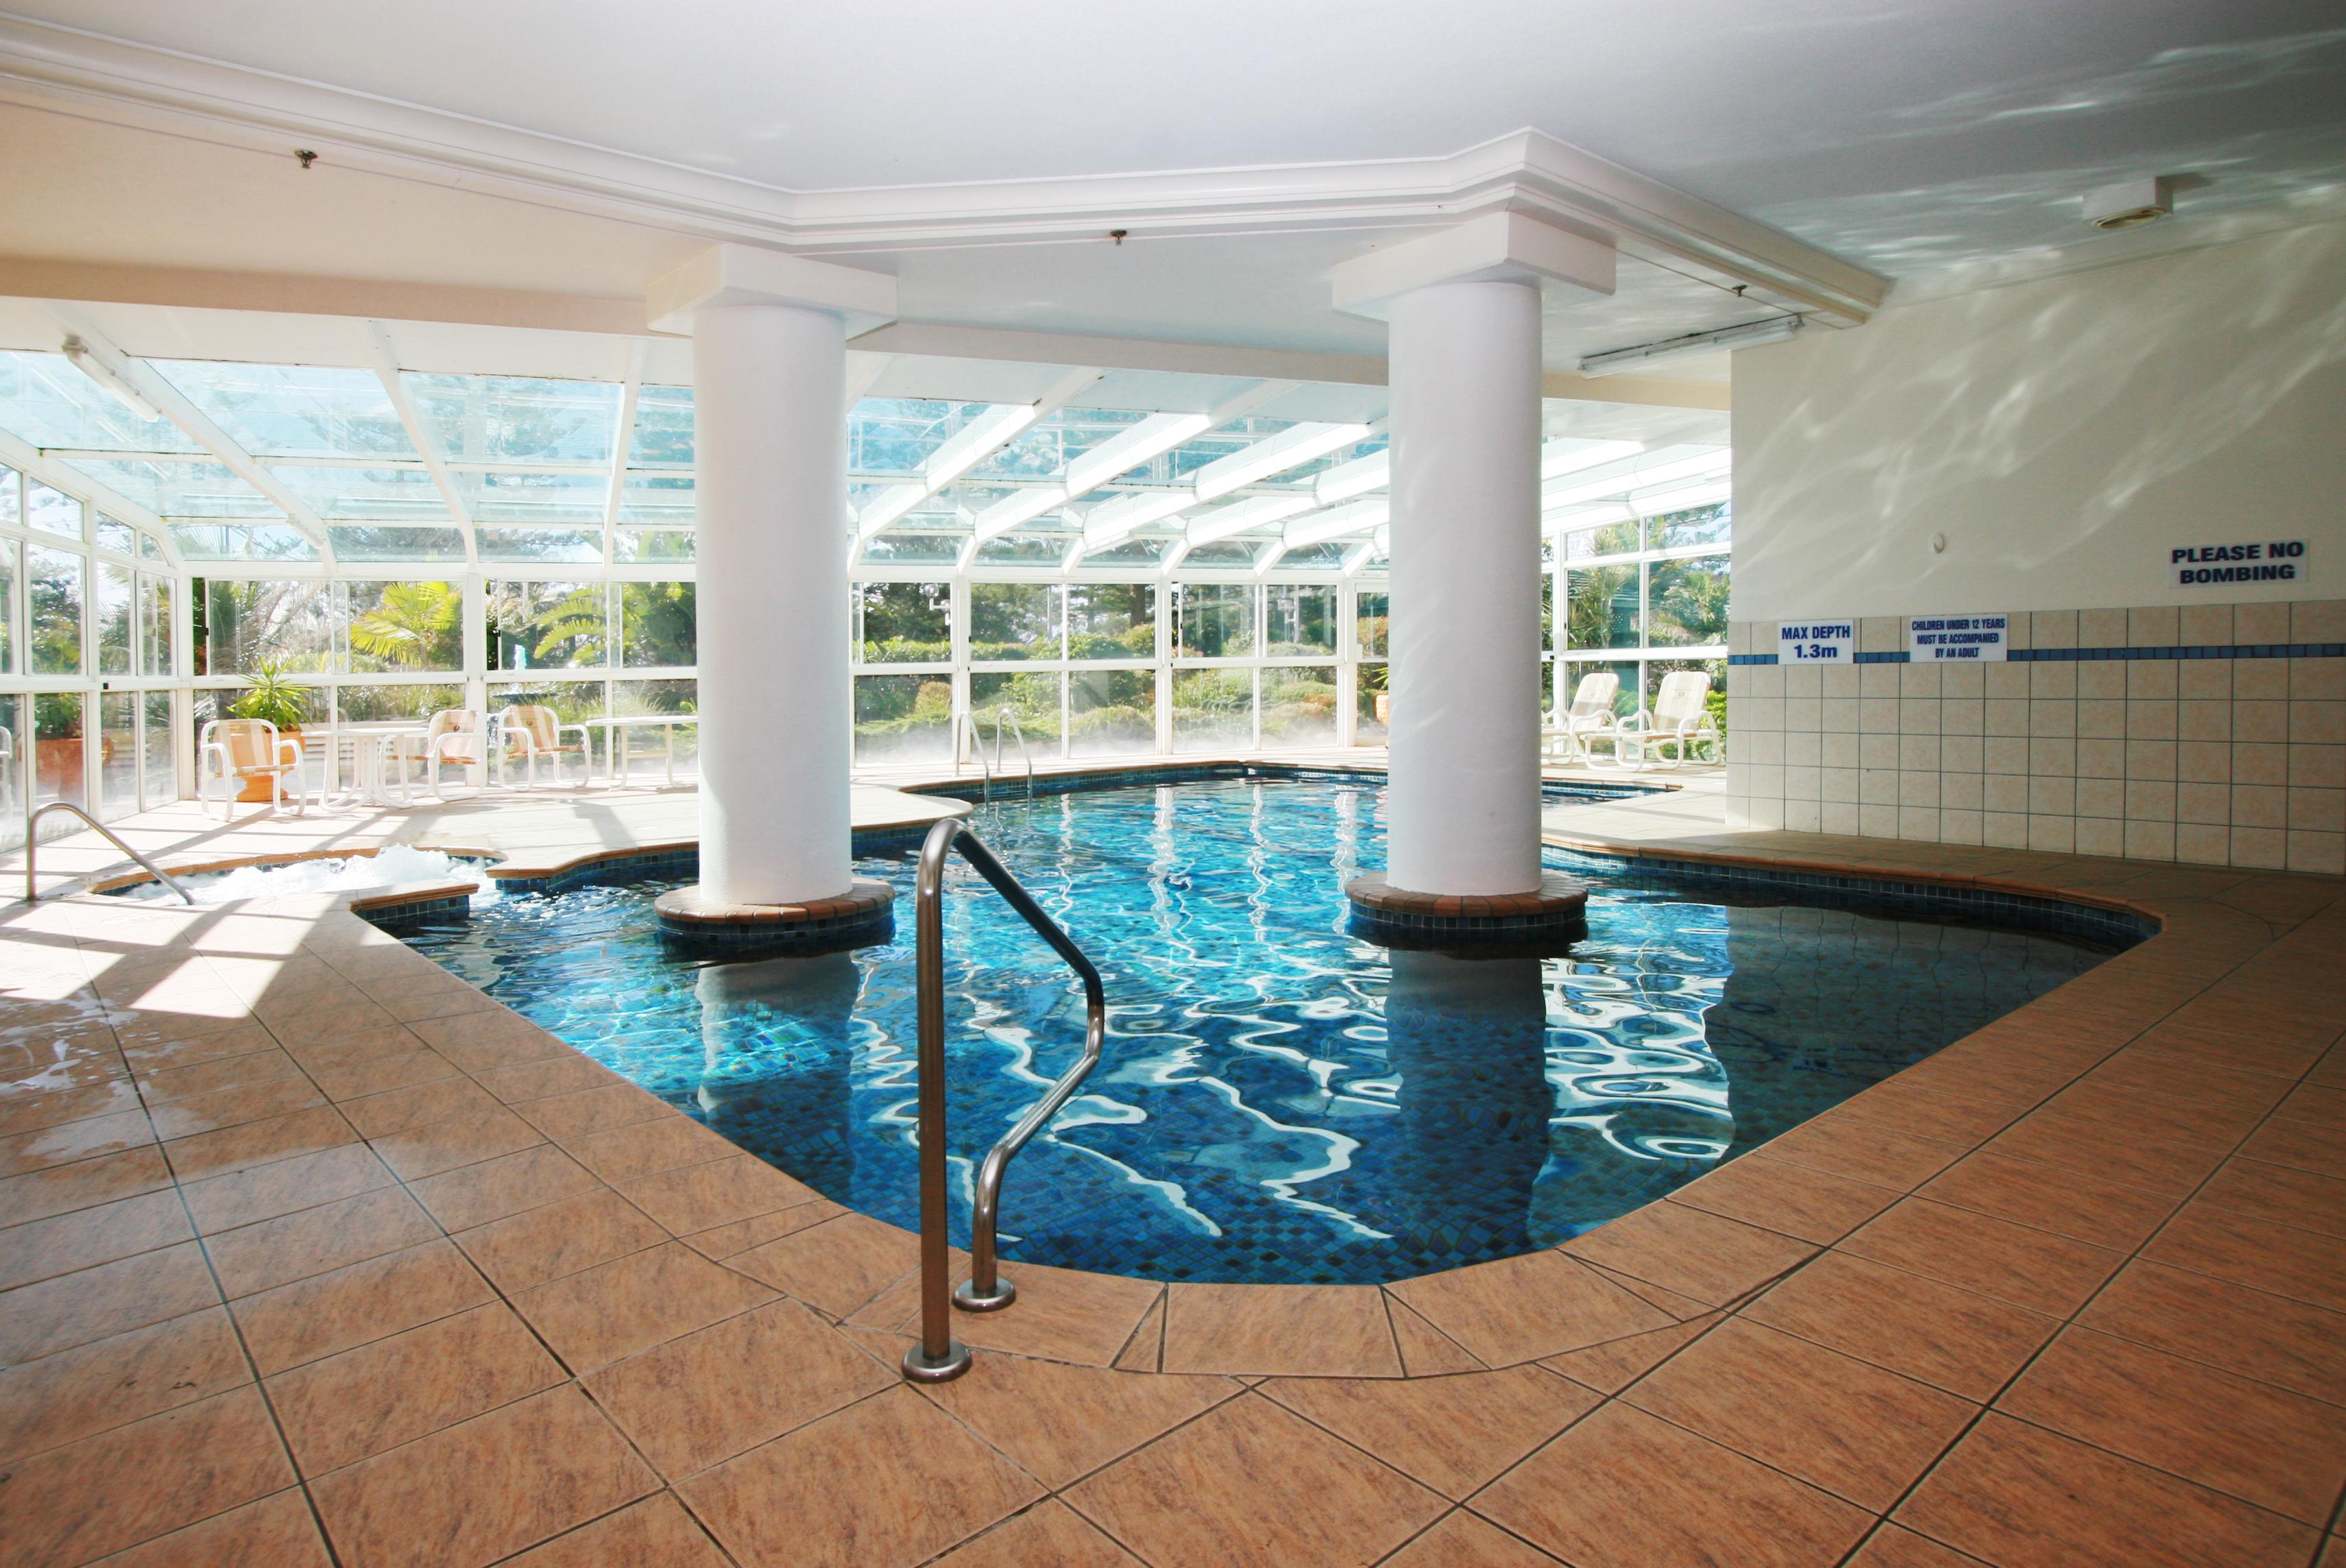 Indoor swimming pool ideas homesfeed for Indoor swimming pool room design